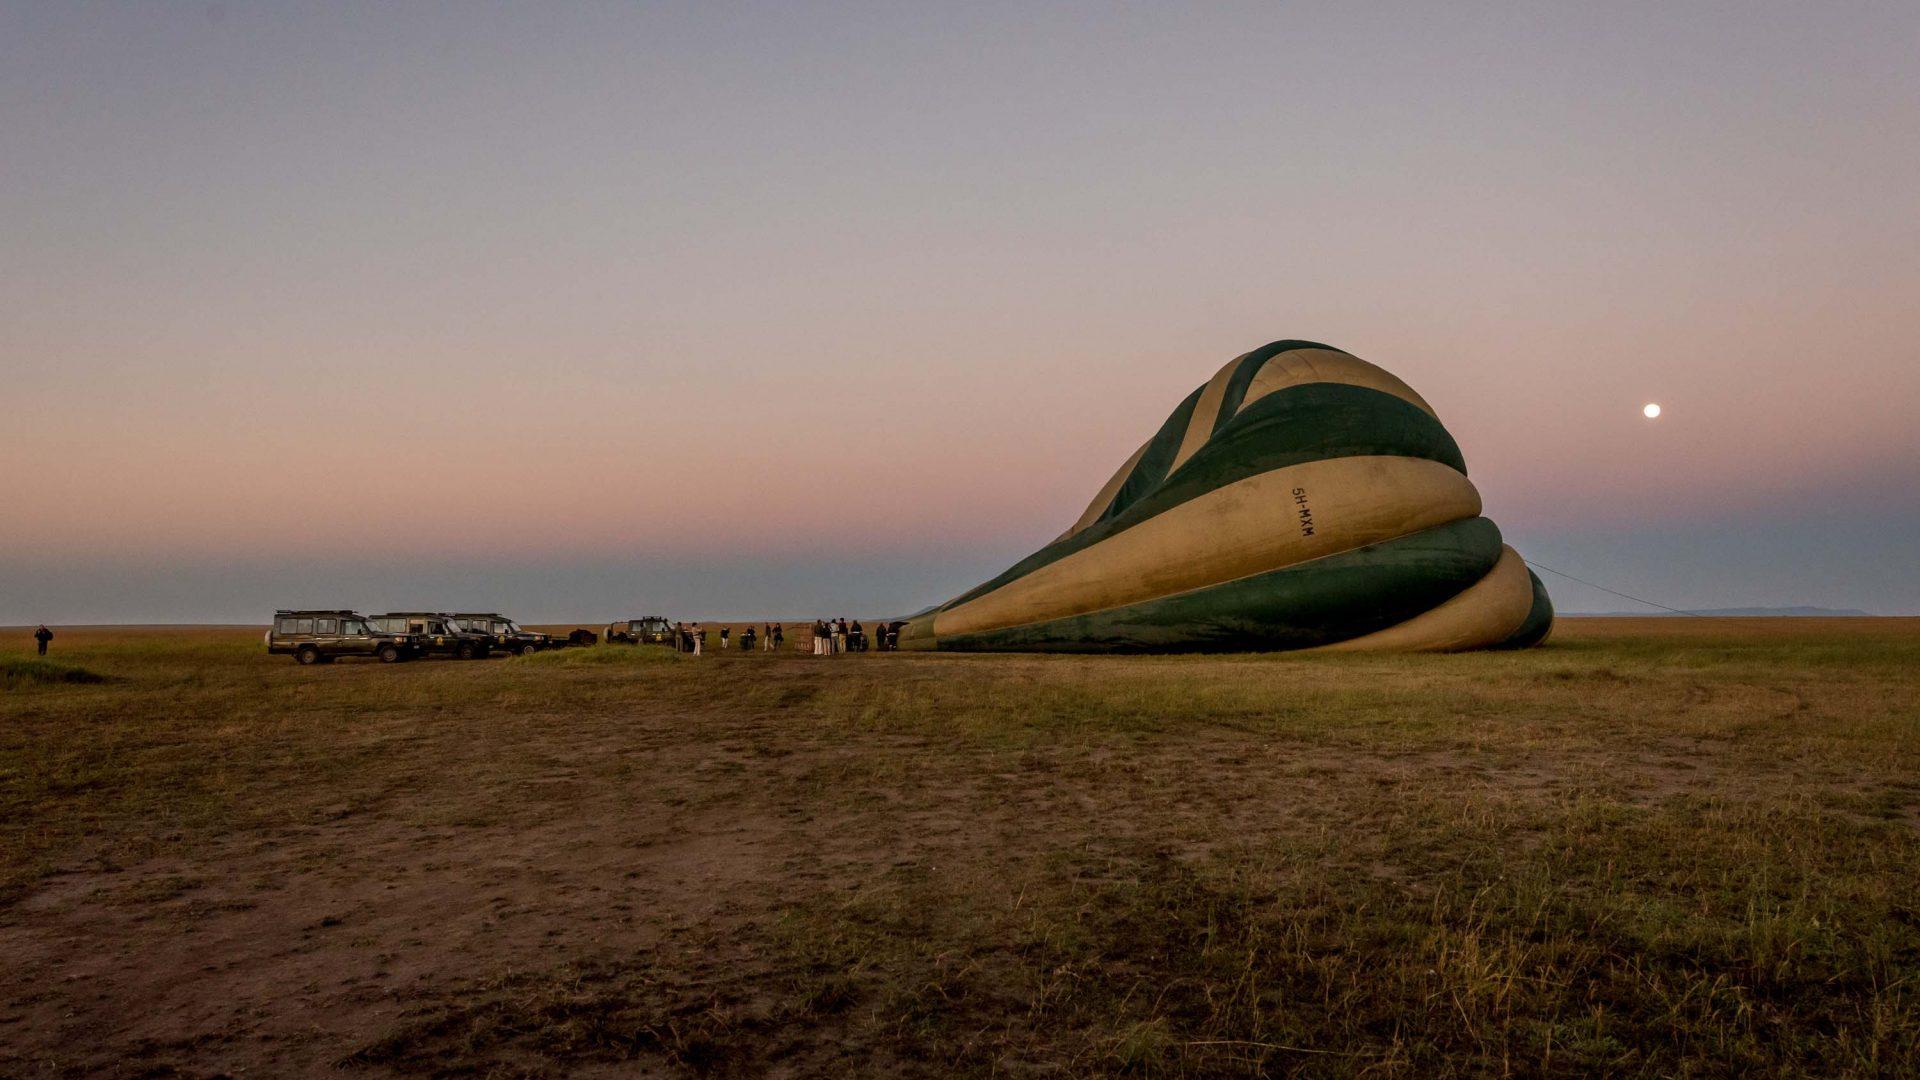 A hot air balloon gets prepared, ready to rise above the Serengeti in Tanzania.